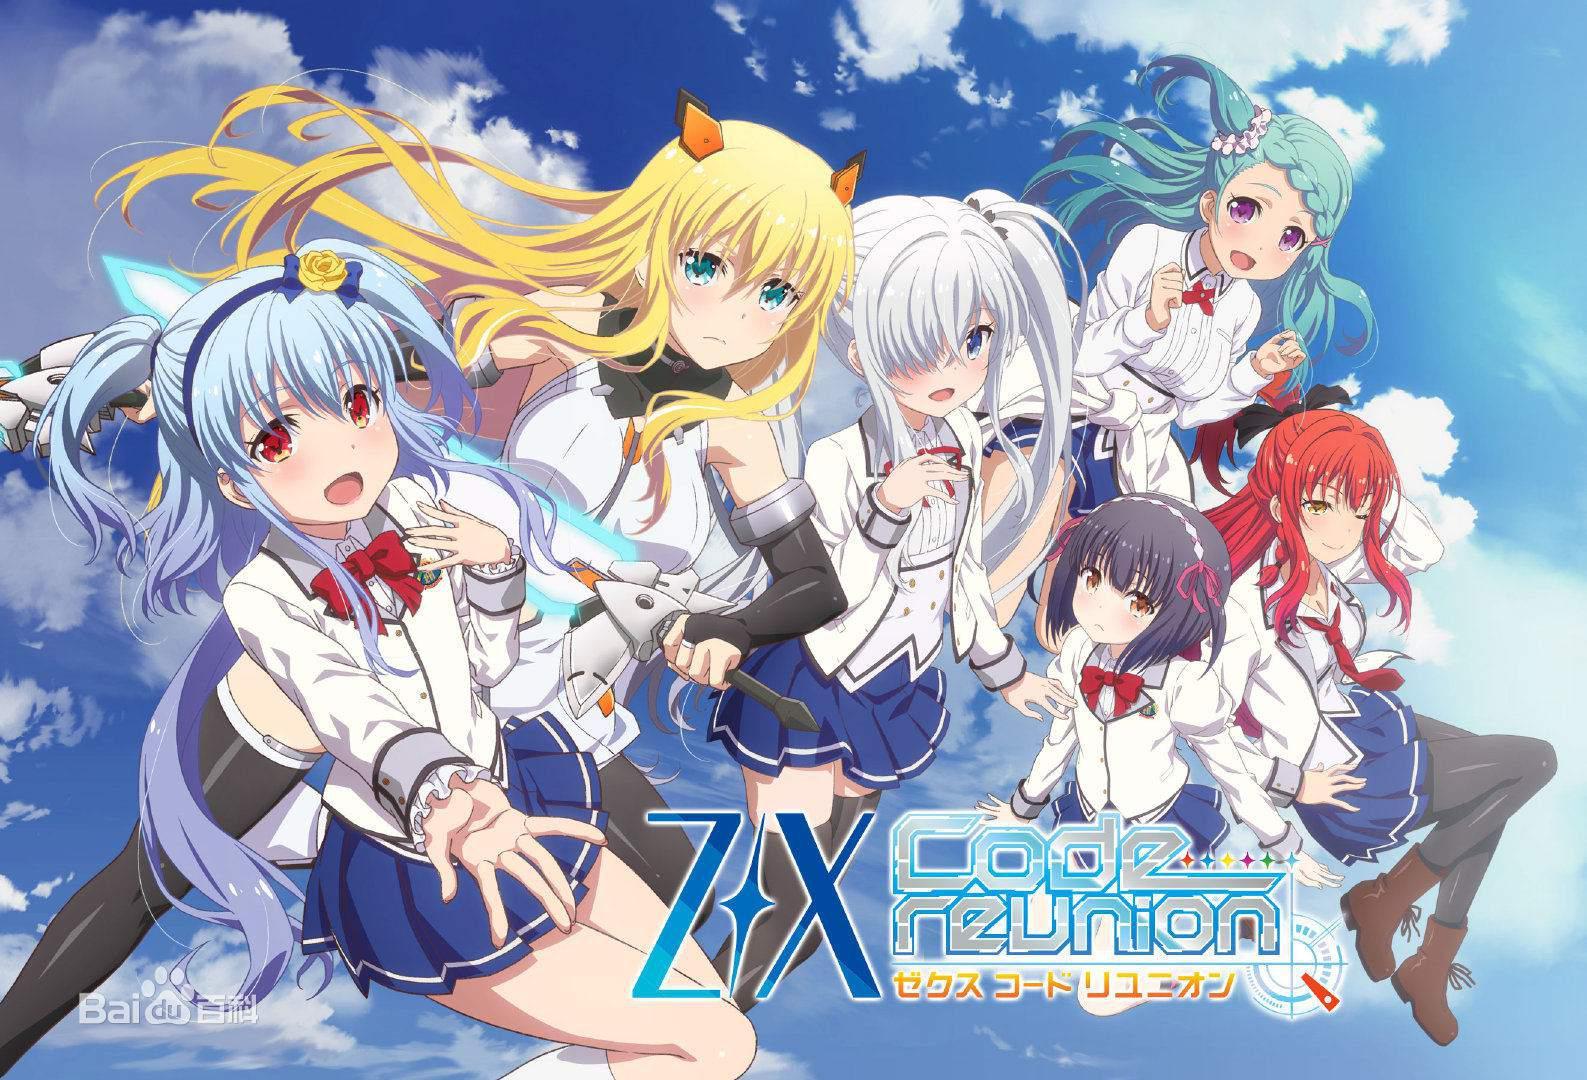 Z/X Code reunion的海报